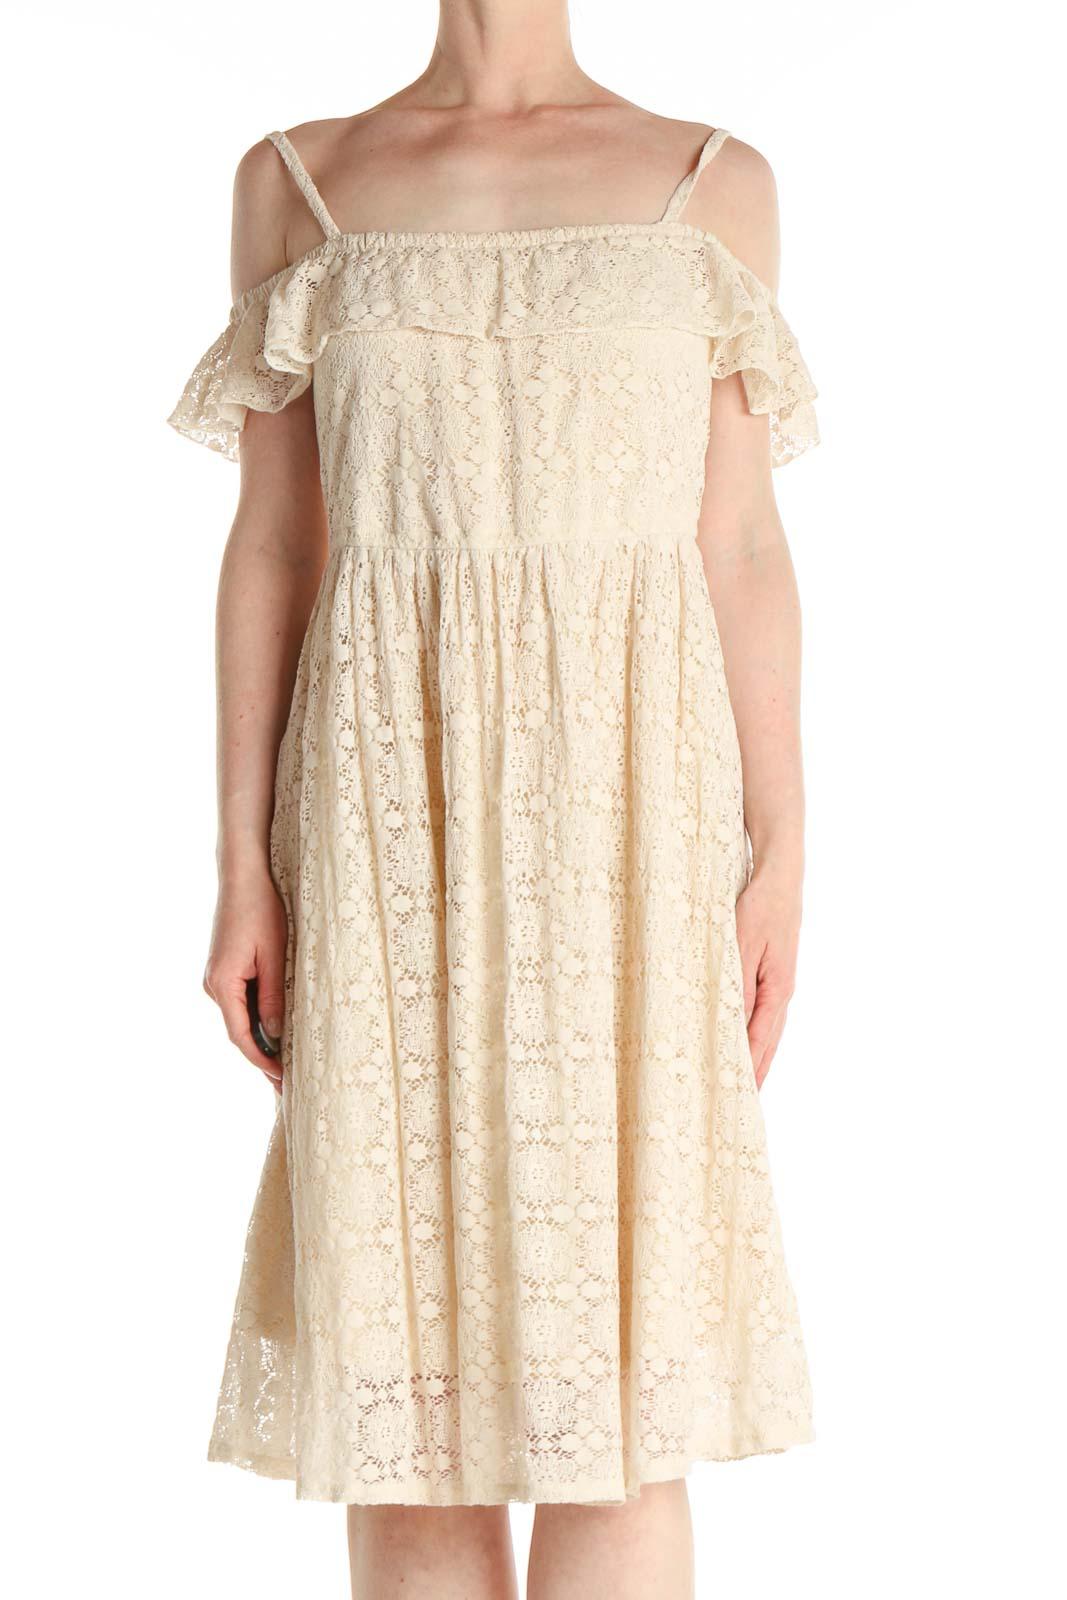 Beige Lace Bohemian Fit & Flare Dress Front